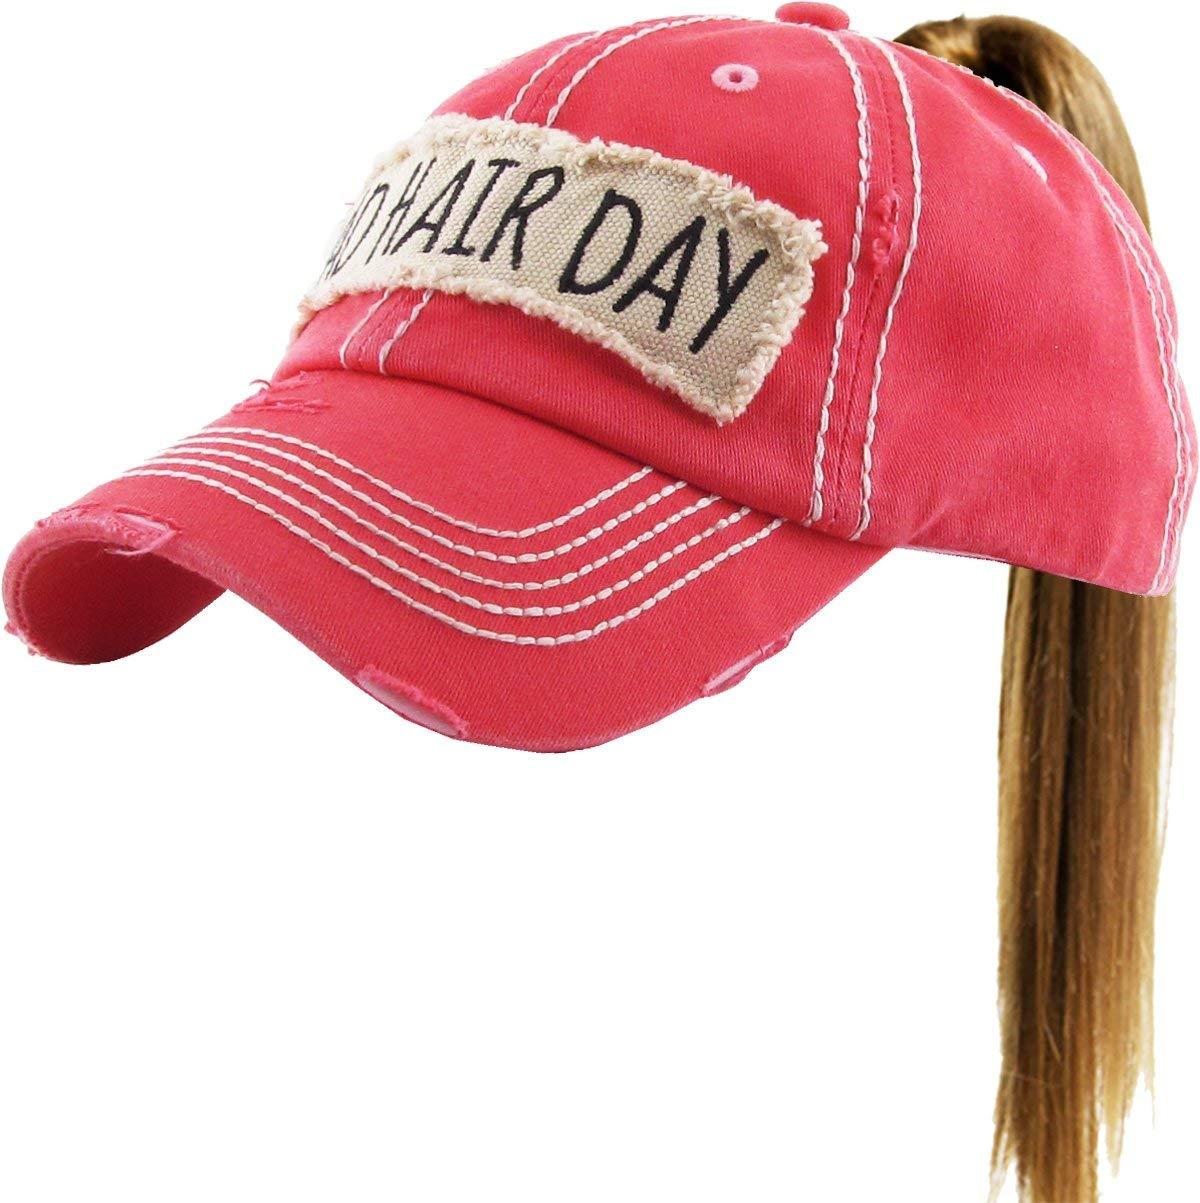 PONY-100 HPK Bad Hair Day Ponytail Messy High Bun Adjustable Cotton Baseball Cap